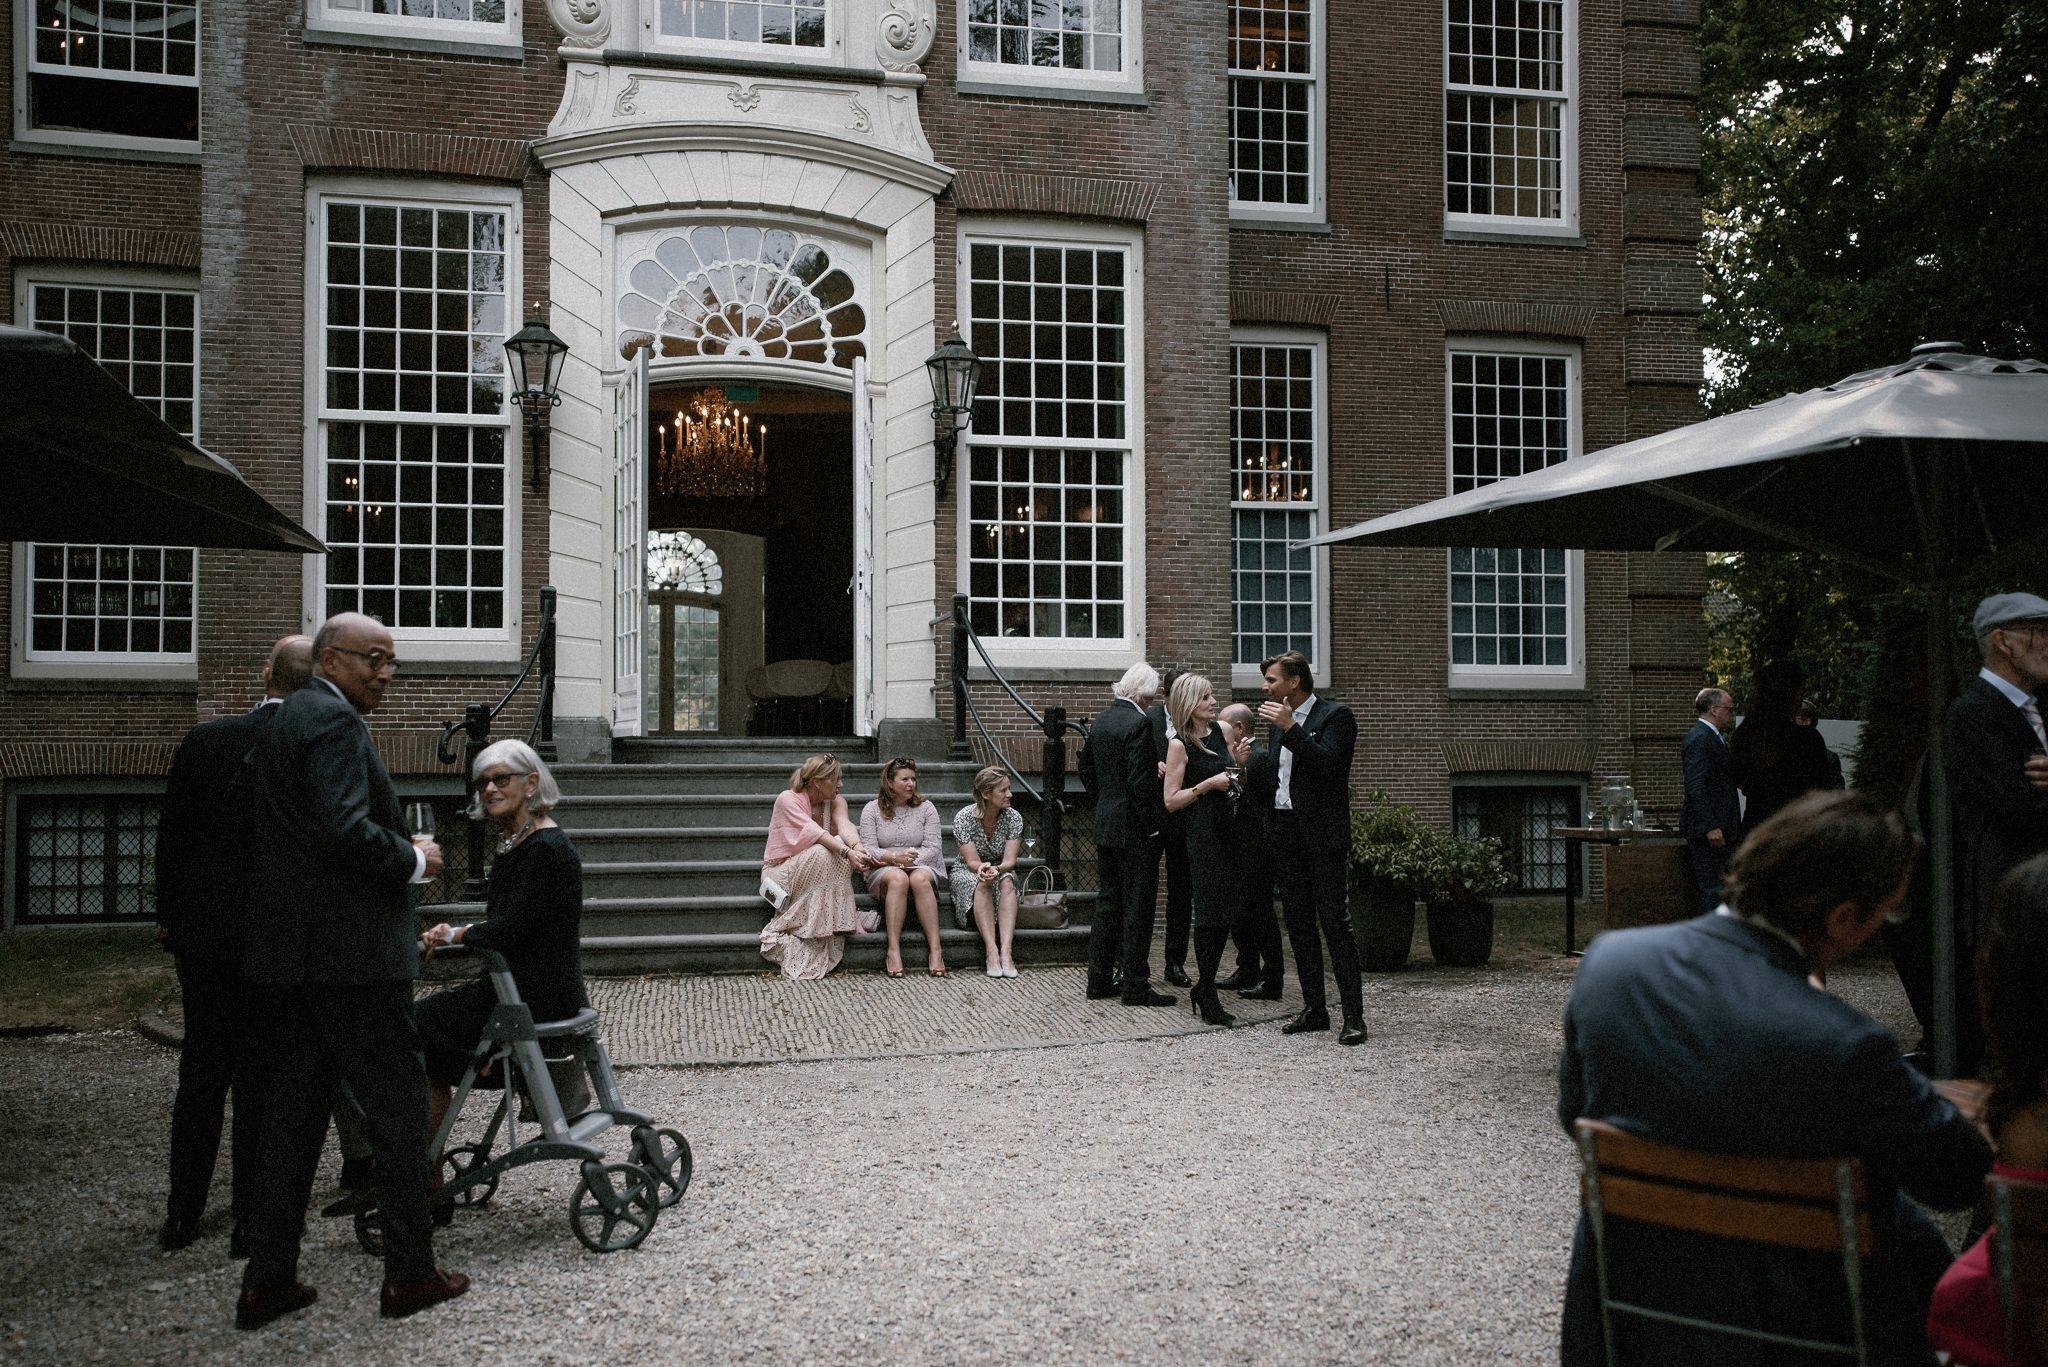 Bruidsfotografie Buitenplaats Sparrendaal - Naomi van der Kraan 0044.jpg